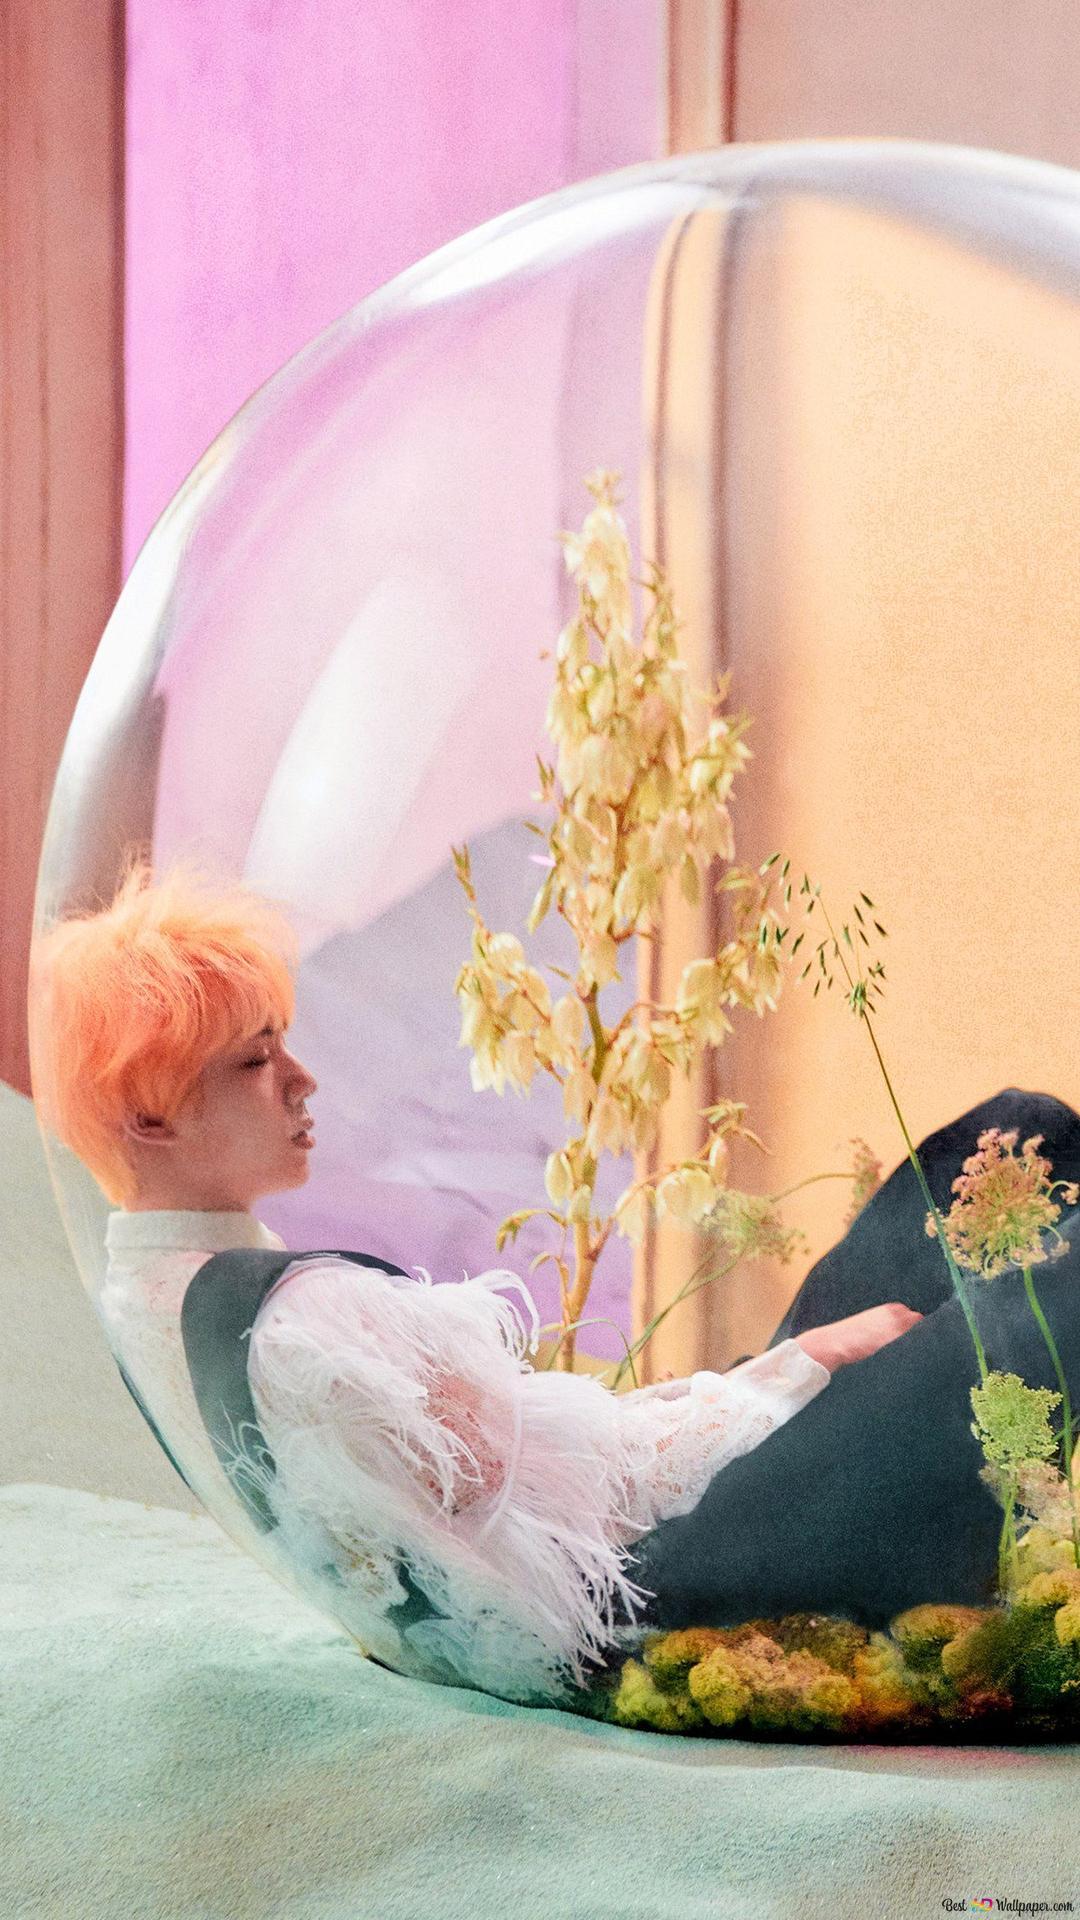 bts jin in love yourself answer mv wallpaper 1080x1920 53625 165